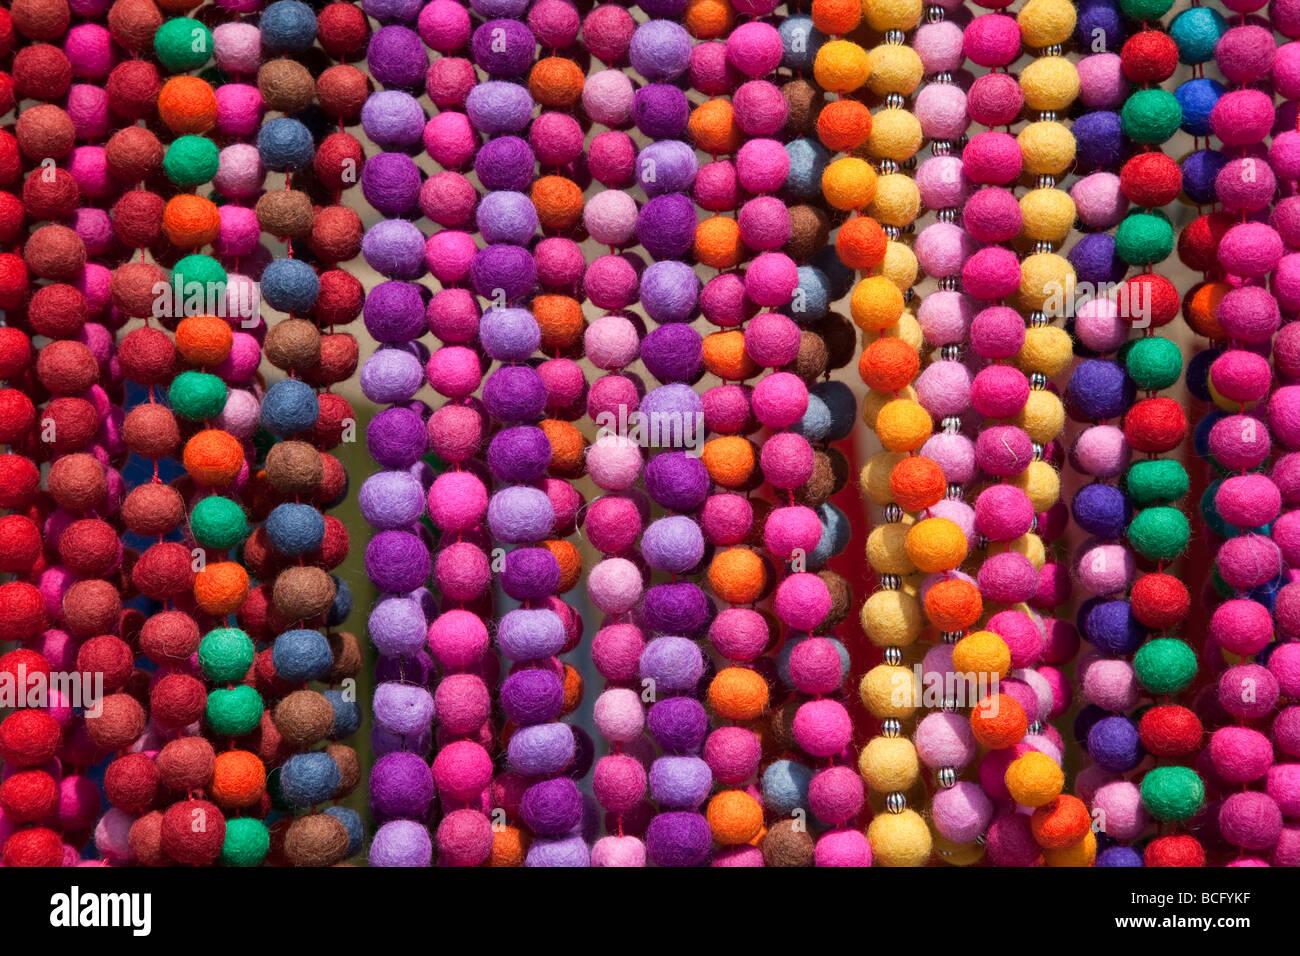 Bunten Stoff Perlen Halsketten auf Markt Sineu Mallorca Spanien Stockbild